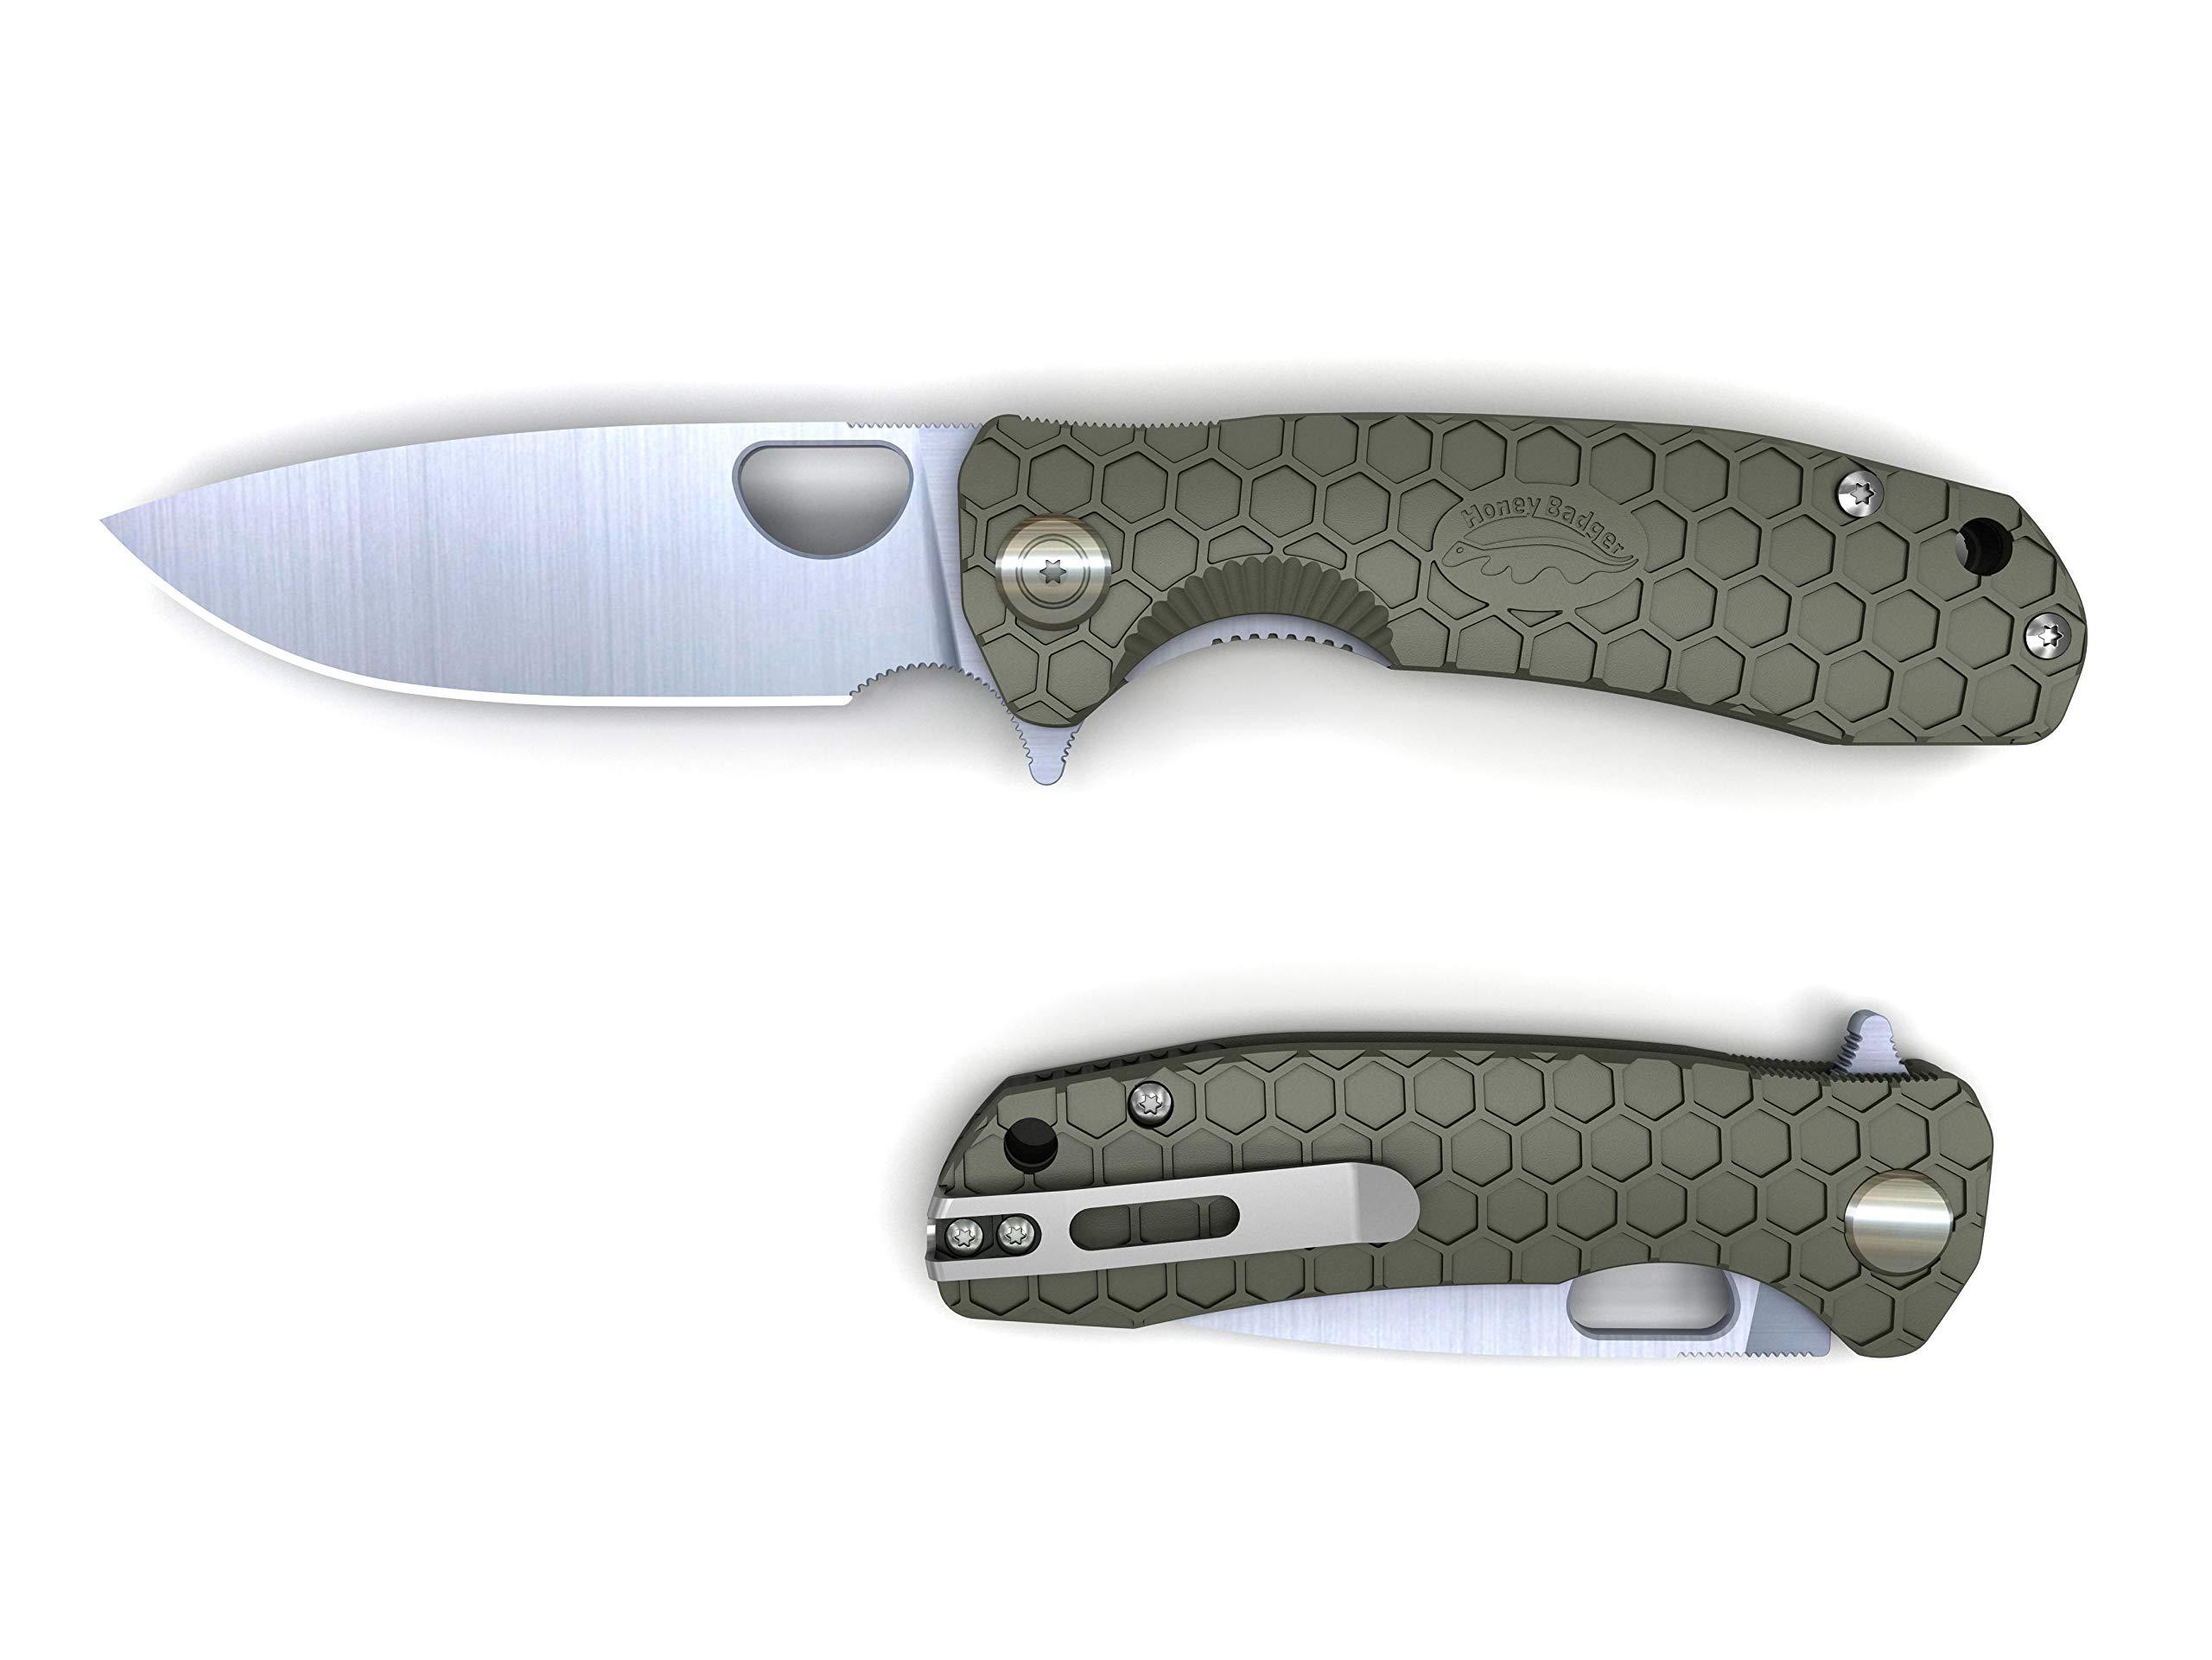 Western Active Honey Badger Flipper Folding Lock Knife Ball Bearing 8cr13MOV Steel Deep Pocket Carry Clip Gift Box with Torx Wrench (Green, Medium 2.96oz - 4.1'' Closed - 3.2'' Blade)